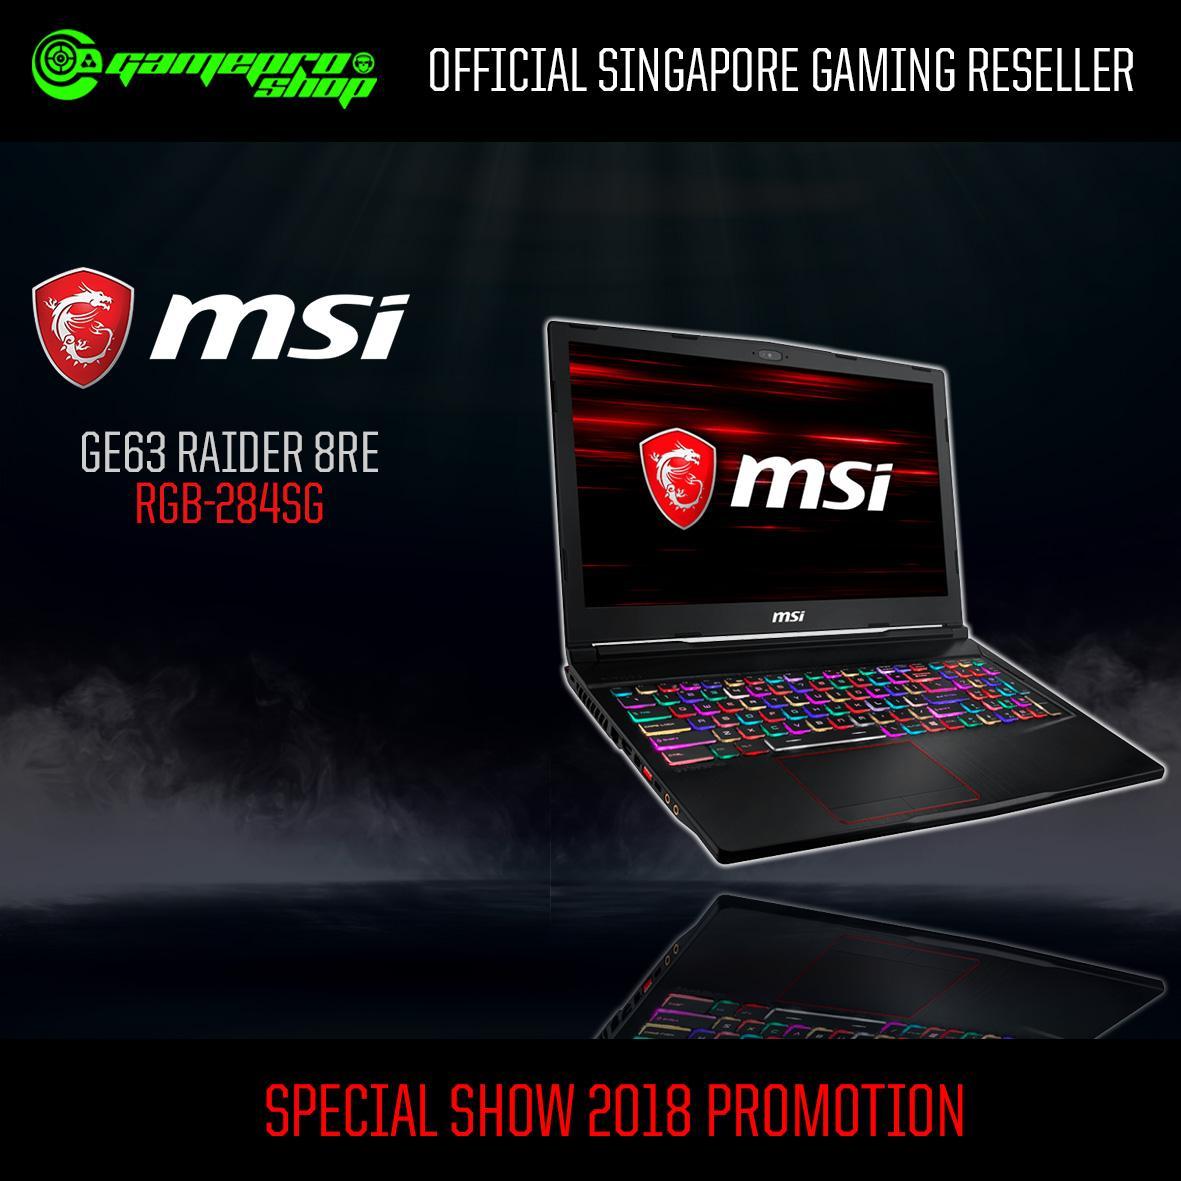 MSI GE63 Raider 8RE RGB-284SG (I7-8750H/16GB/256GB SSD/GTX1060)15.6″ with 120Hz Gaming Laptop *COMEX PROMO*